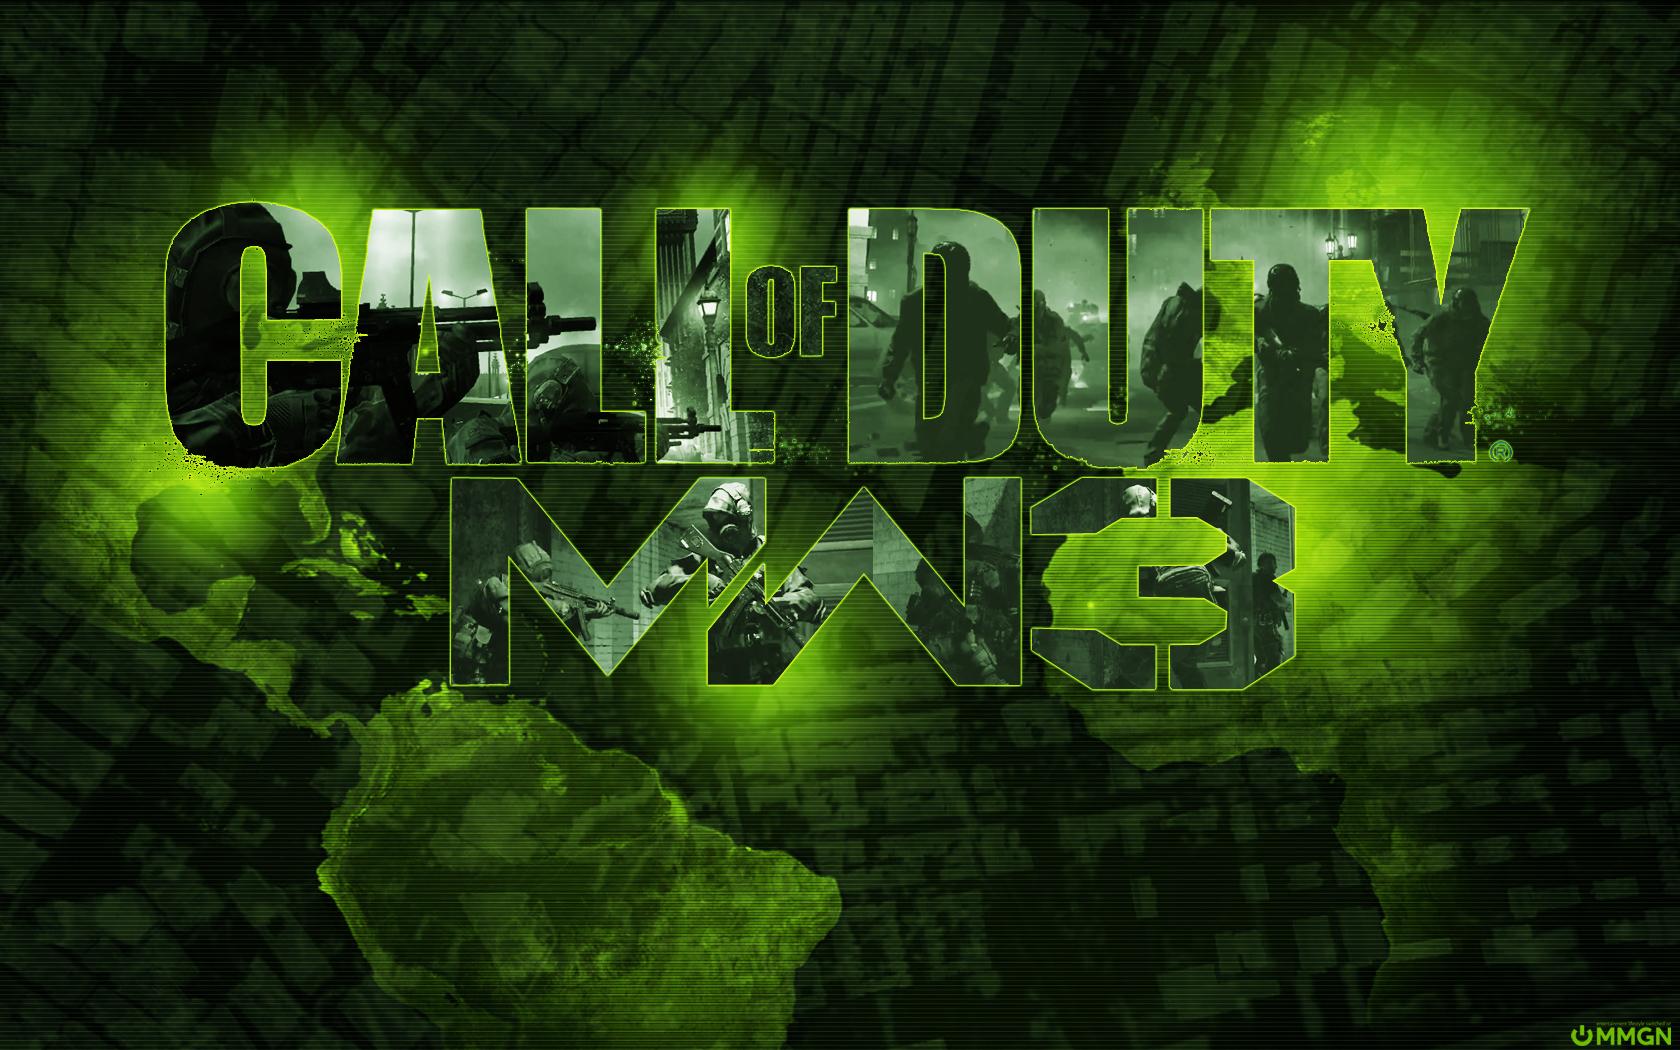 Call of Duty Modern Warfare 3 Wallpapers   MMGN Blogs 1680x1050